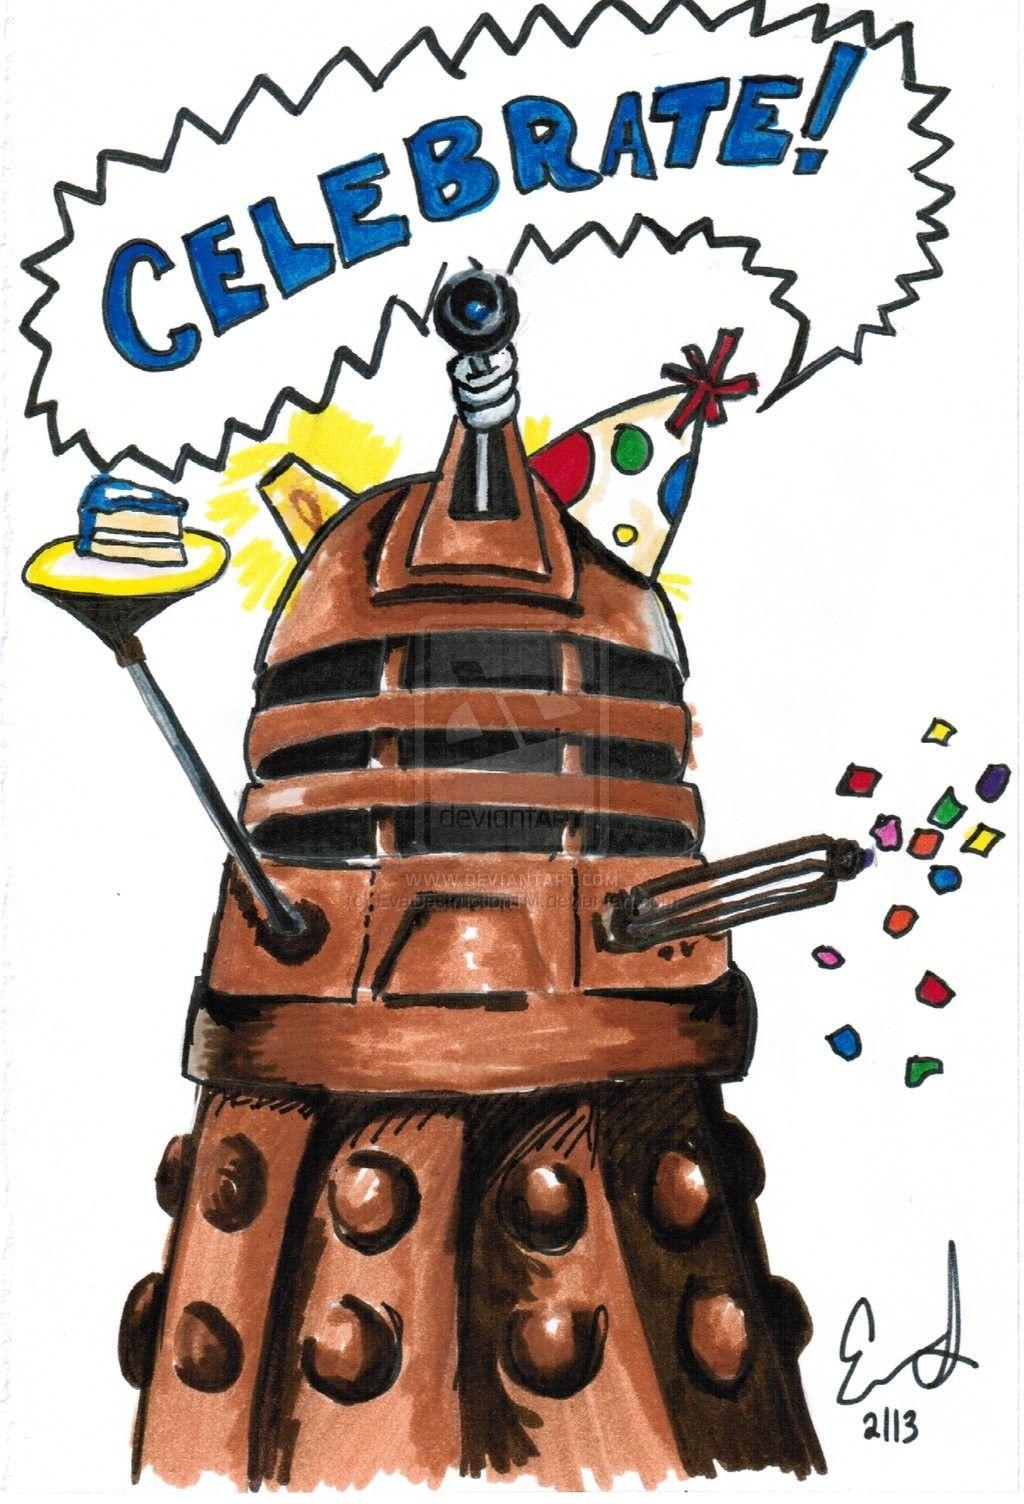 Creative Celebrate Doctor Who Birthday Card For Your Birthday Card – Doctor Who Birthday Card